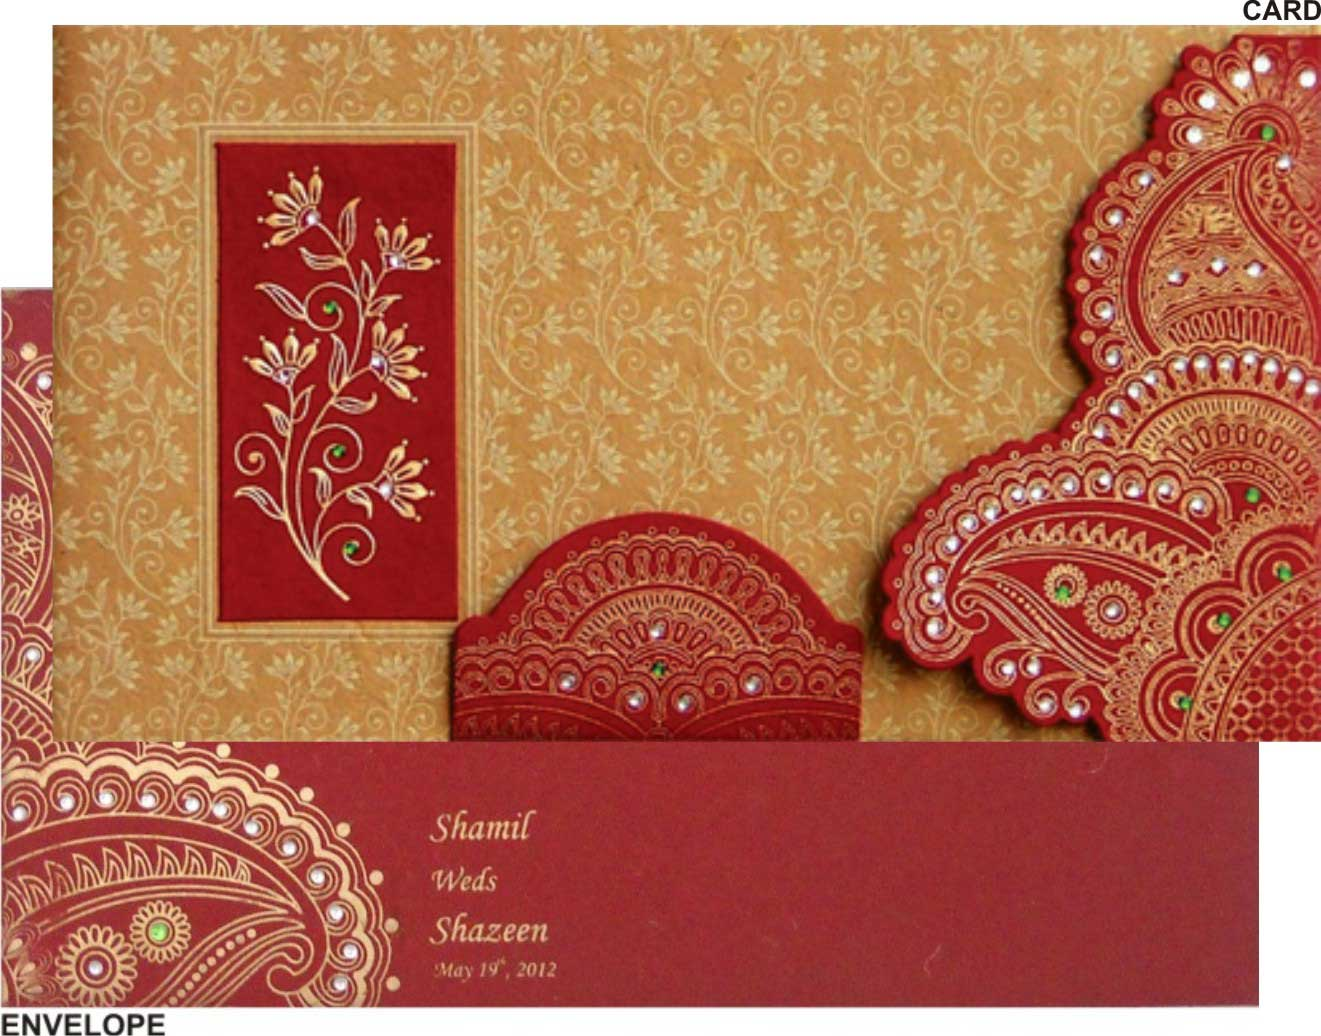 ihwc0010 indian wedding cards design indian wedding cards wedding – Indian Wedding Cards Design